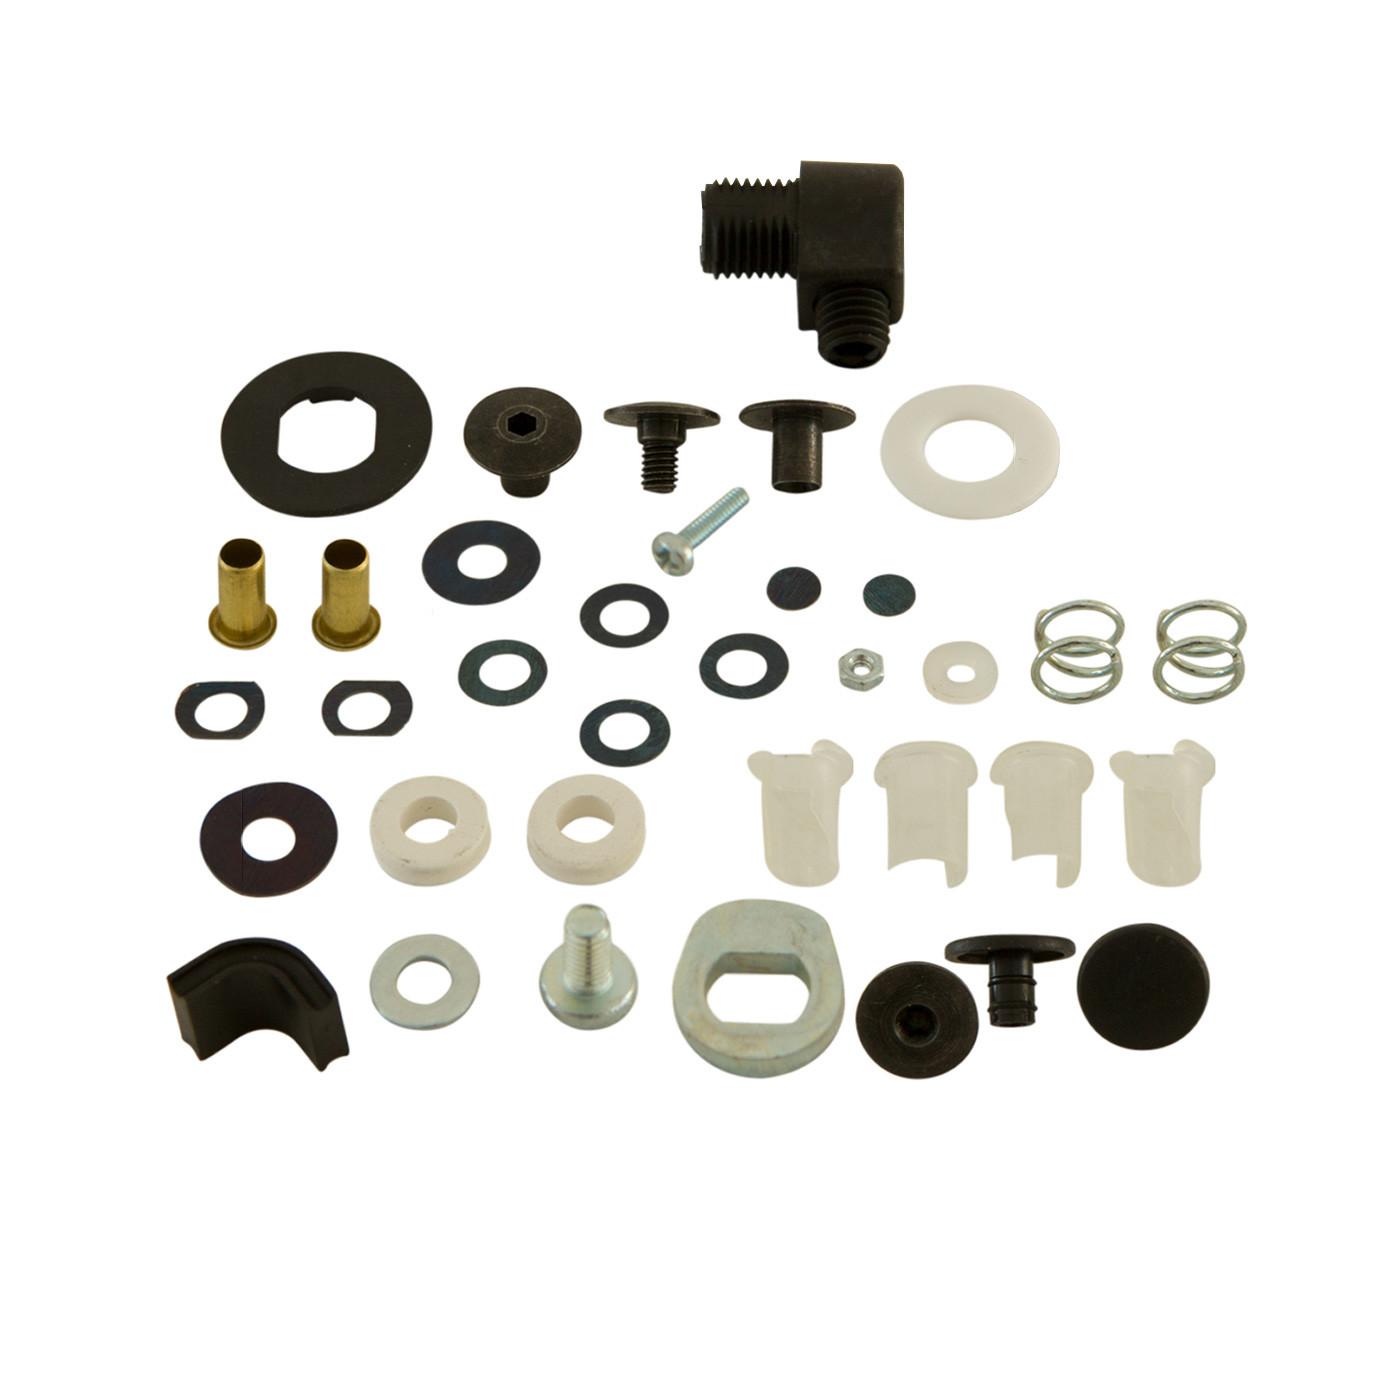 Artemide Tolomeo Micro Befestigungs-Set